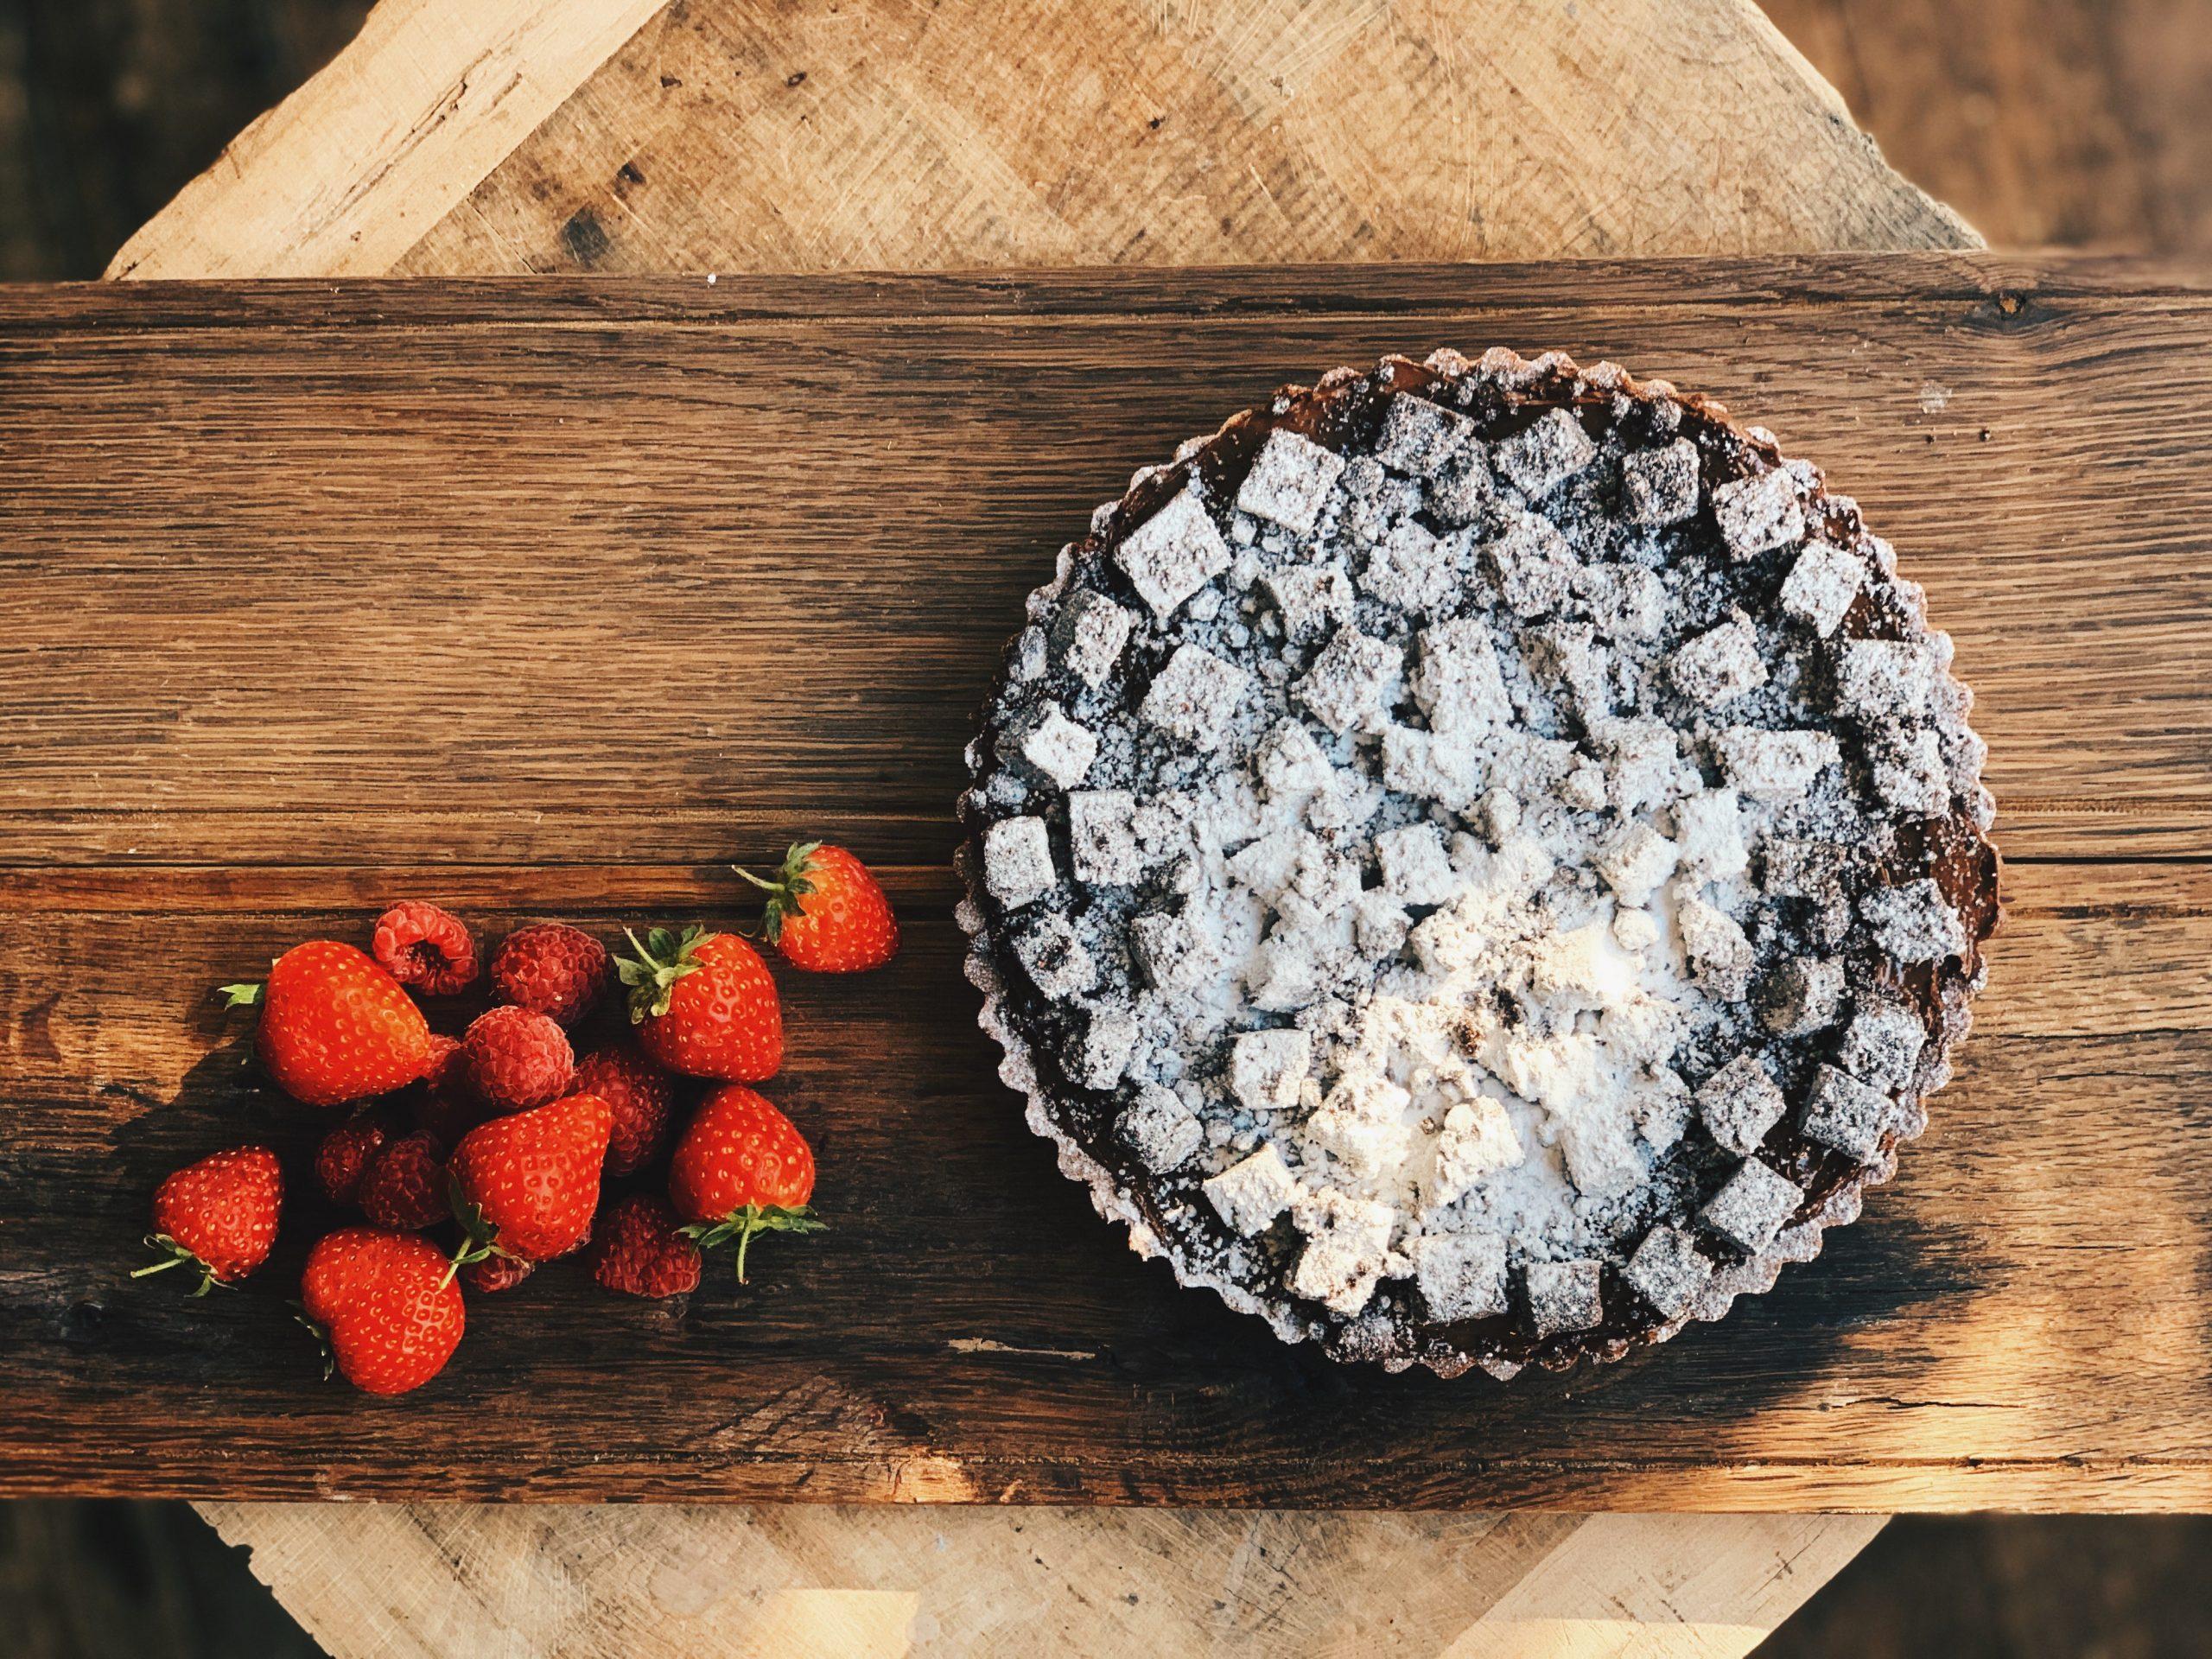 chocolate pudding and strawberries